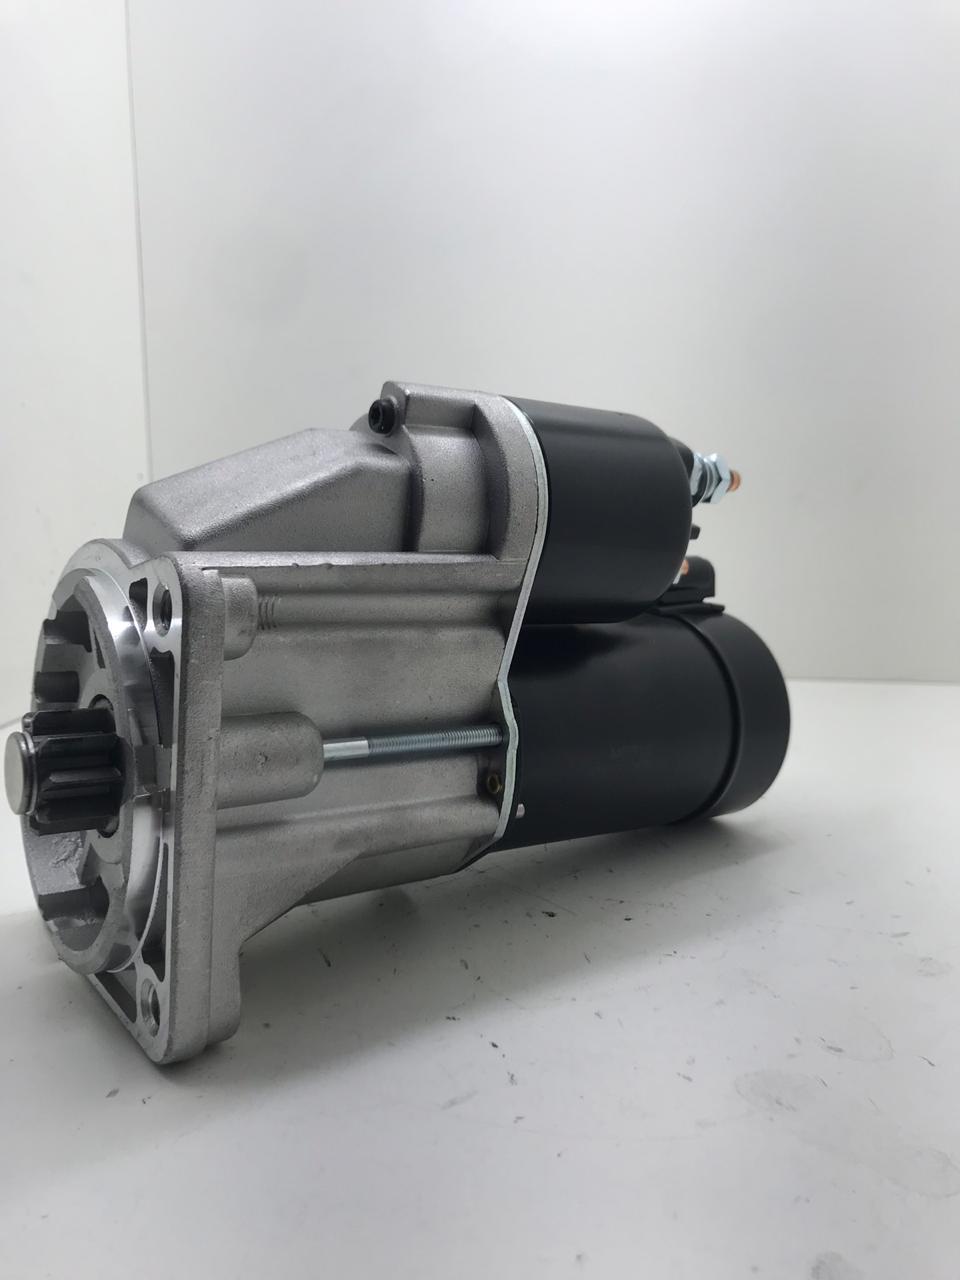 Motor de Arranque Gol Santana Parati Saveiro Voyage 1.6 1.8 SEM EIXO GUIA MOTOR AP F000AL0400 F000ALO301 D6RA50P QDY1234B 80 120 01 E 20513 D 20173